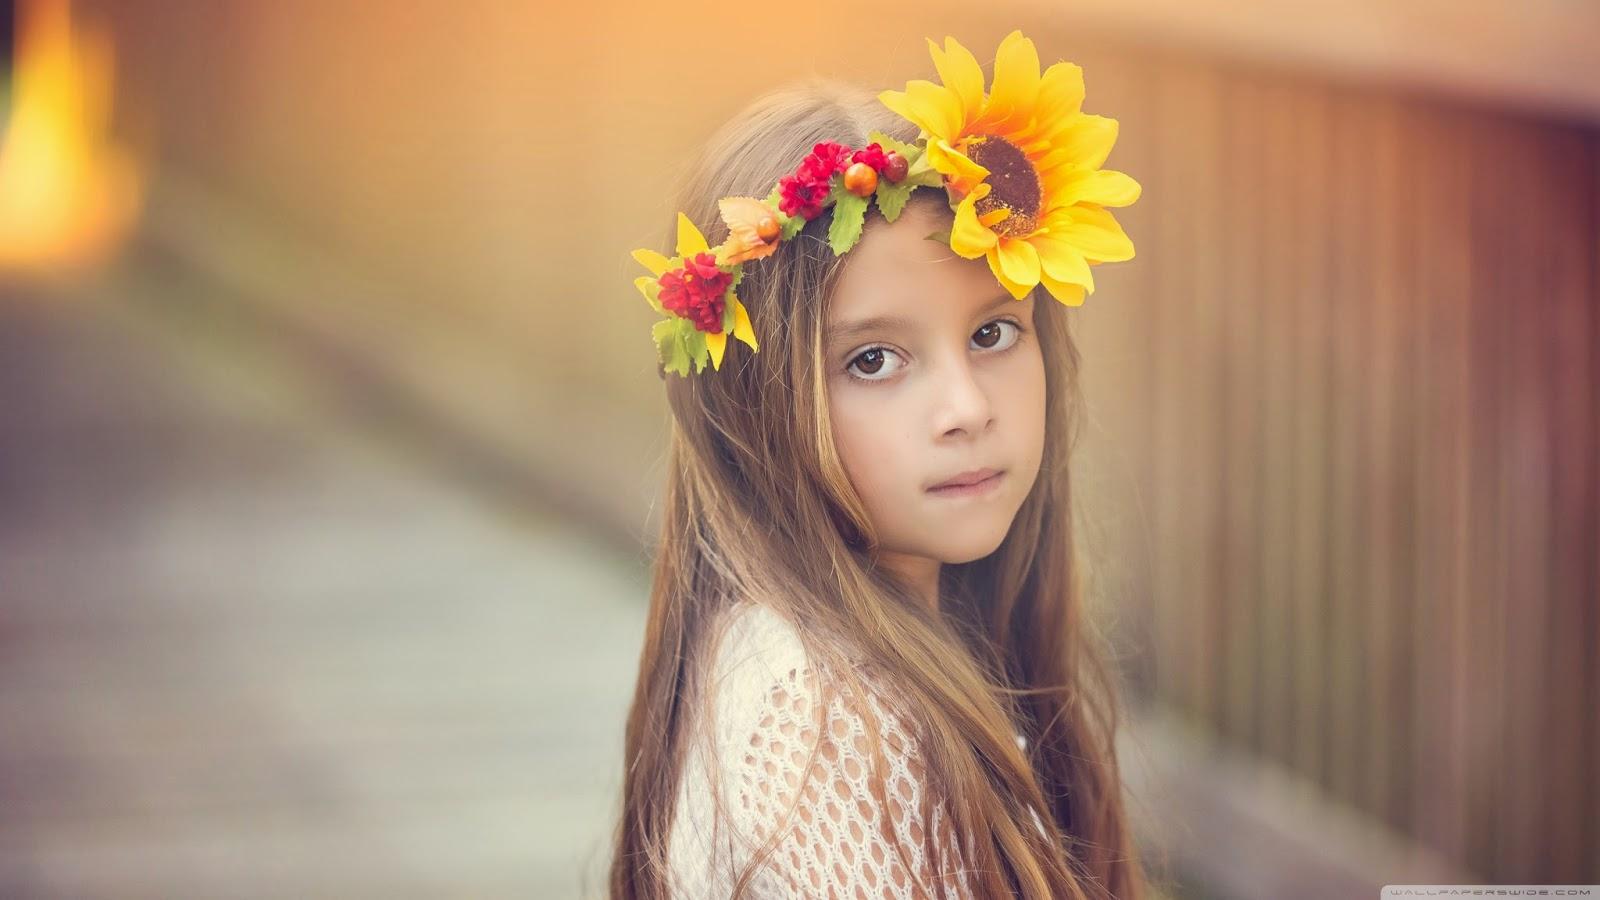 child girl cute wallpaper